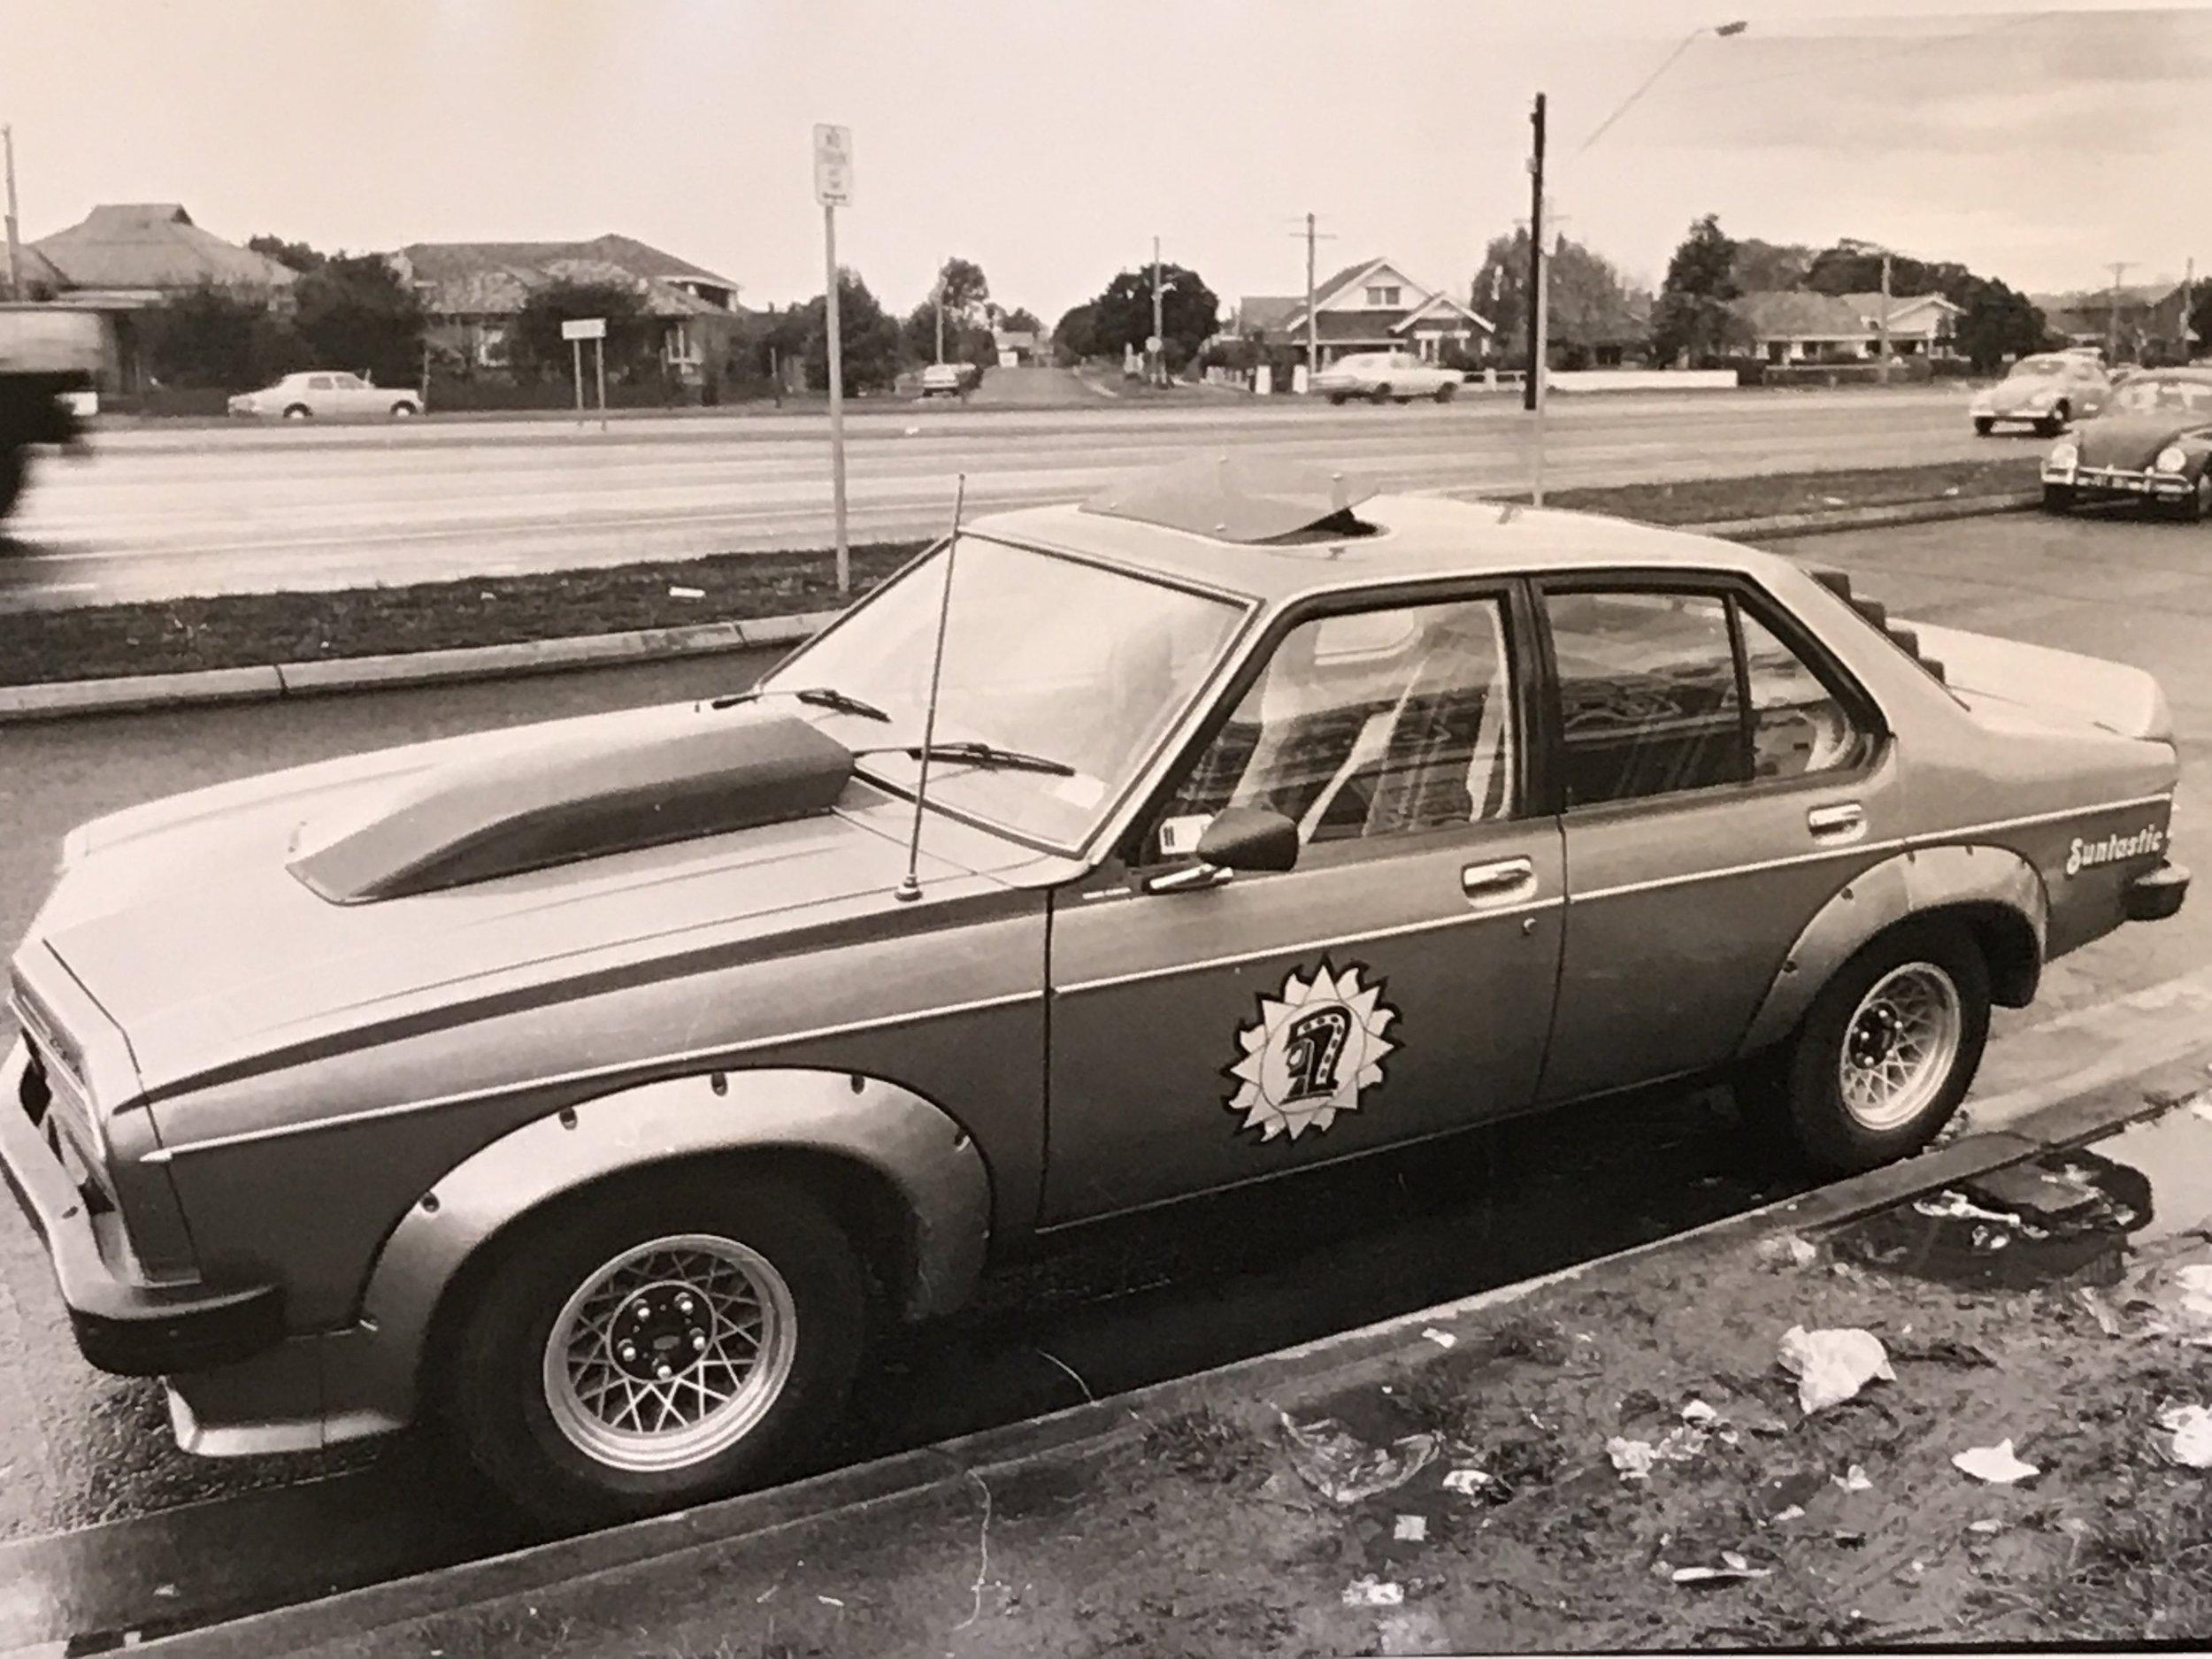 Restyled Holden Torana 1970s